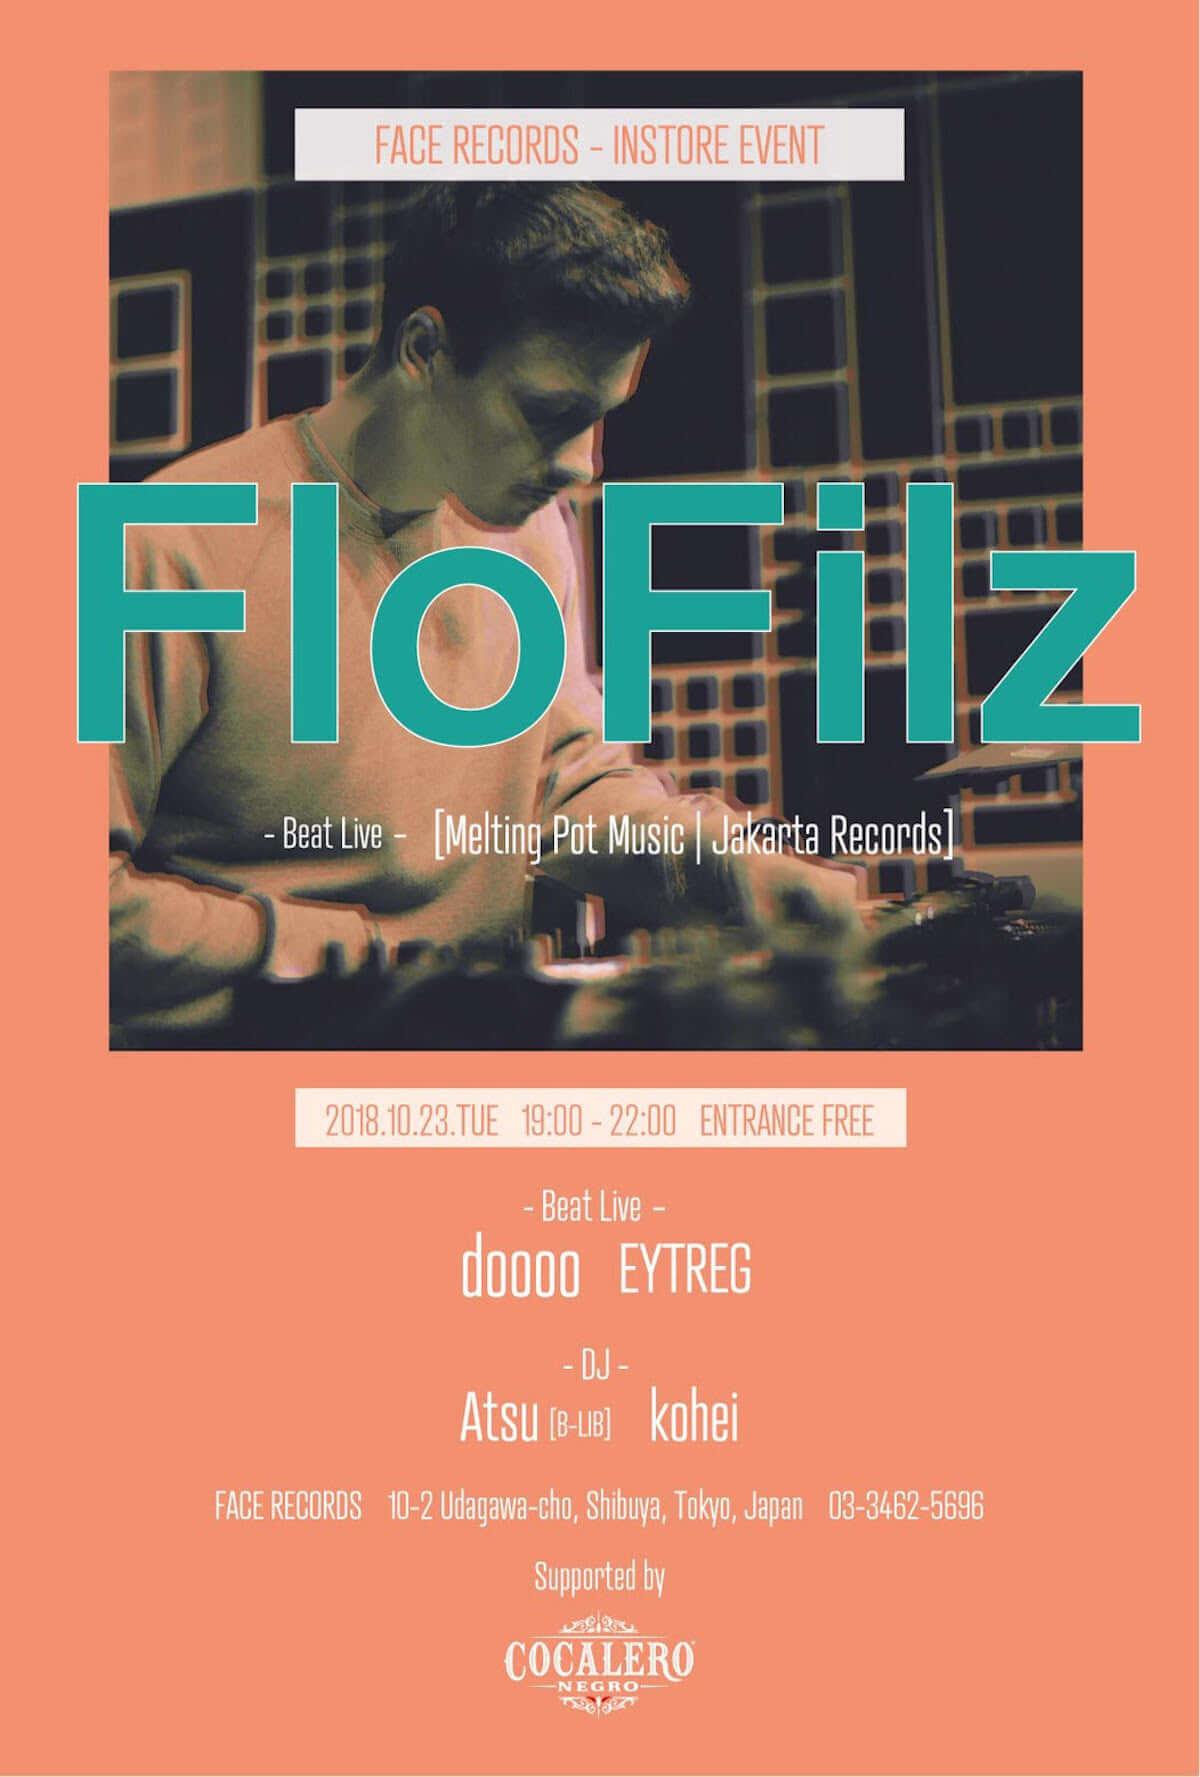 FACE RECORDSが3ヶ月連続でインストアイベント開催!ドイツ・ベルリン発の若手アーティストFloFilz出演! music181019_facerecords_04-1200x1777